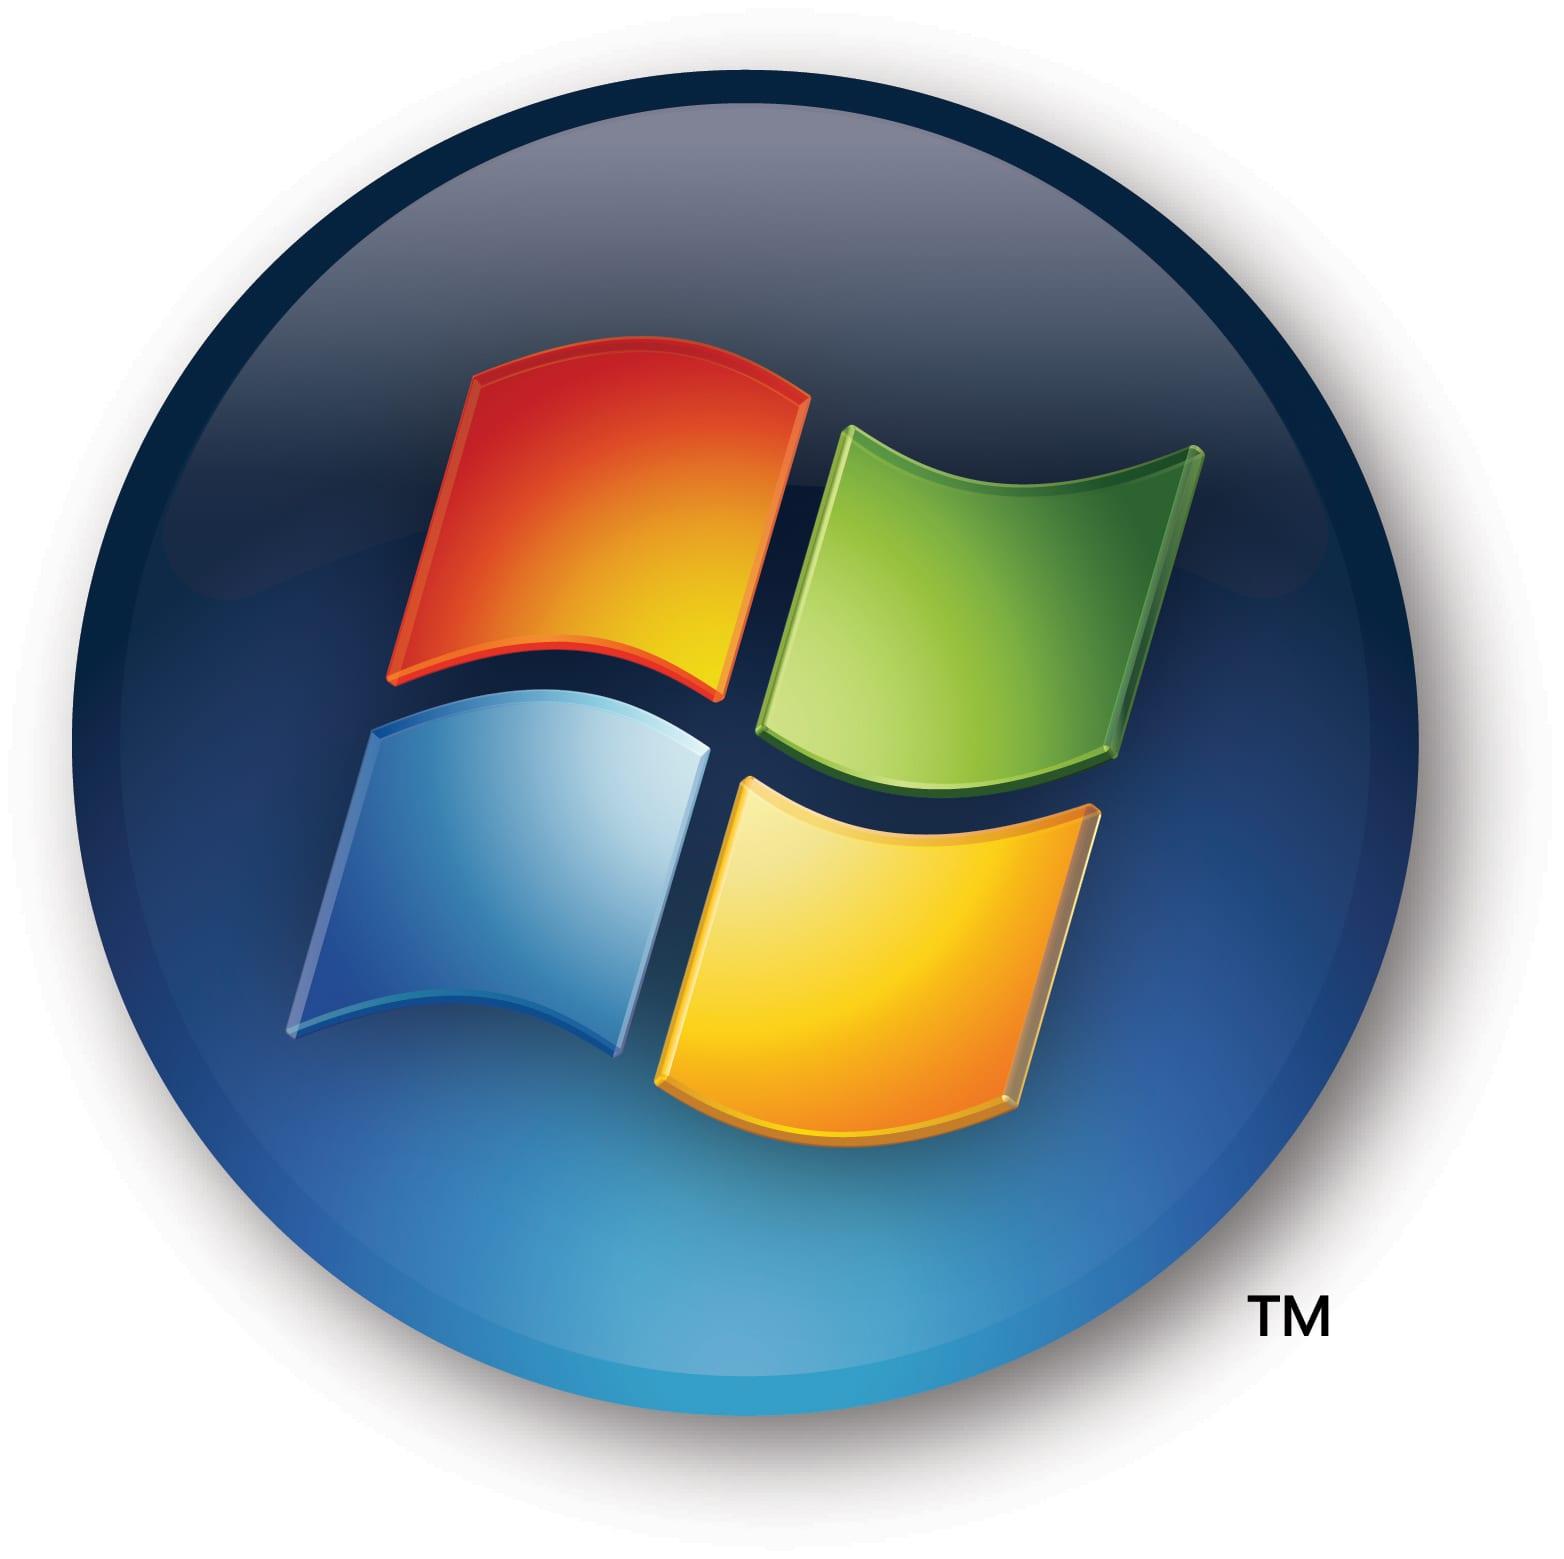 microsoft-windows-vista-logo